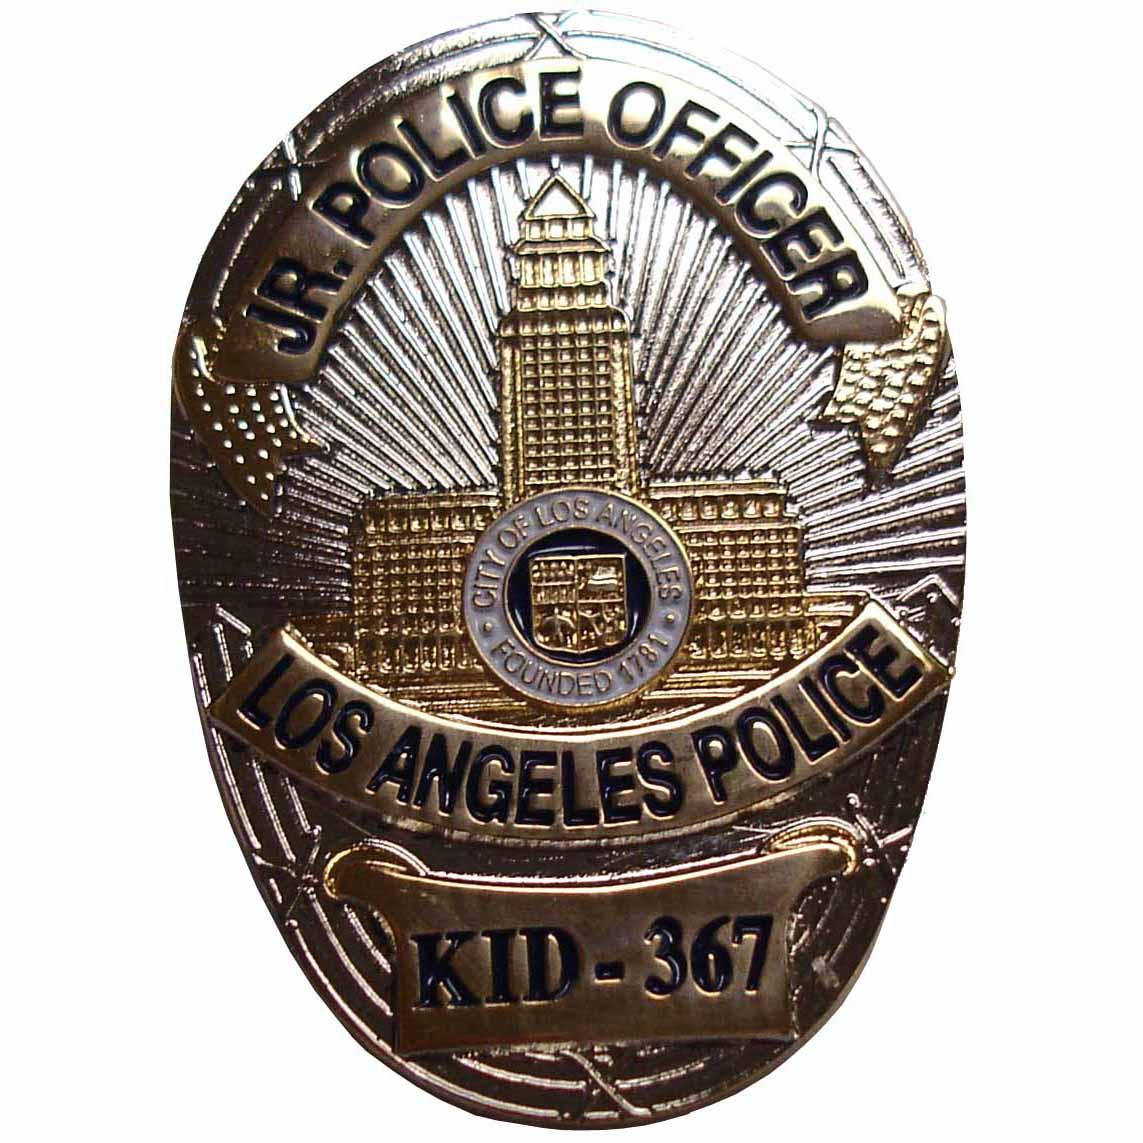 lapd badge-#21